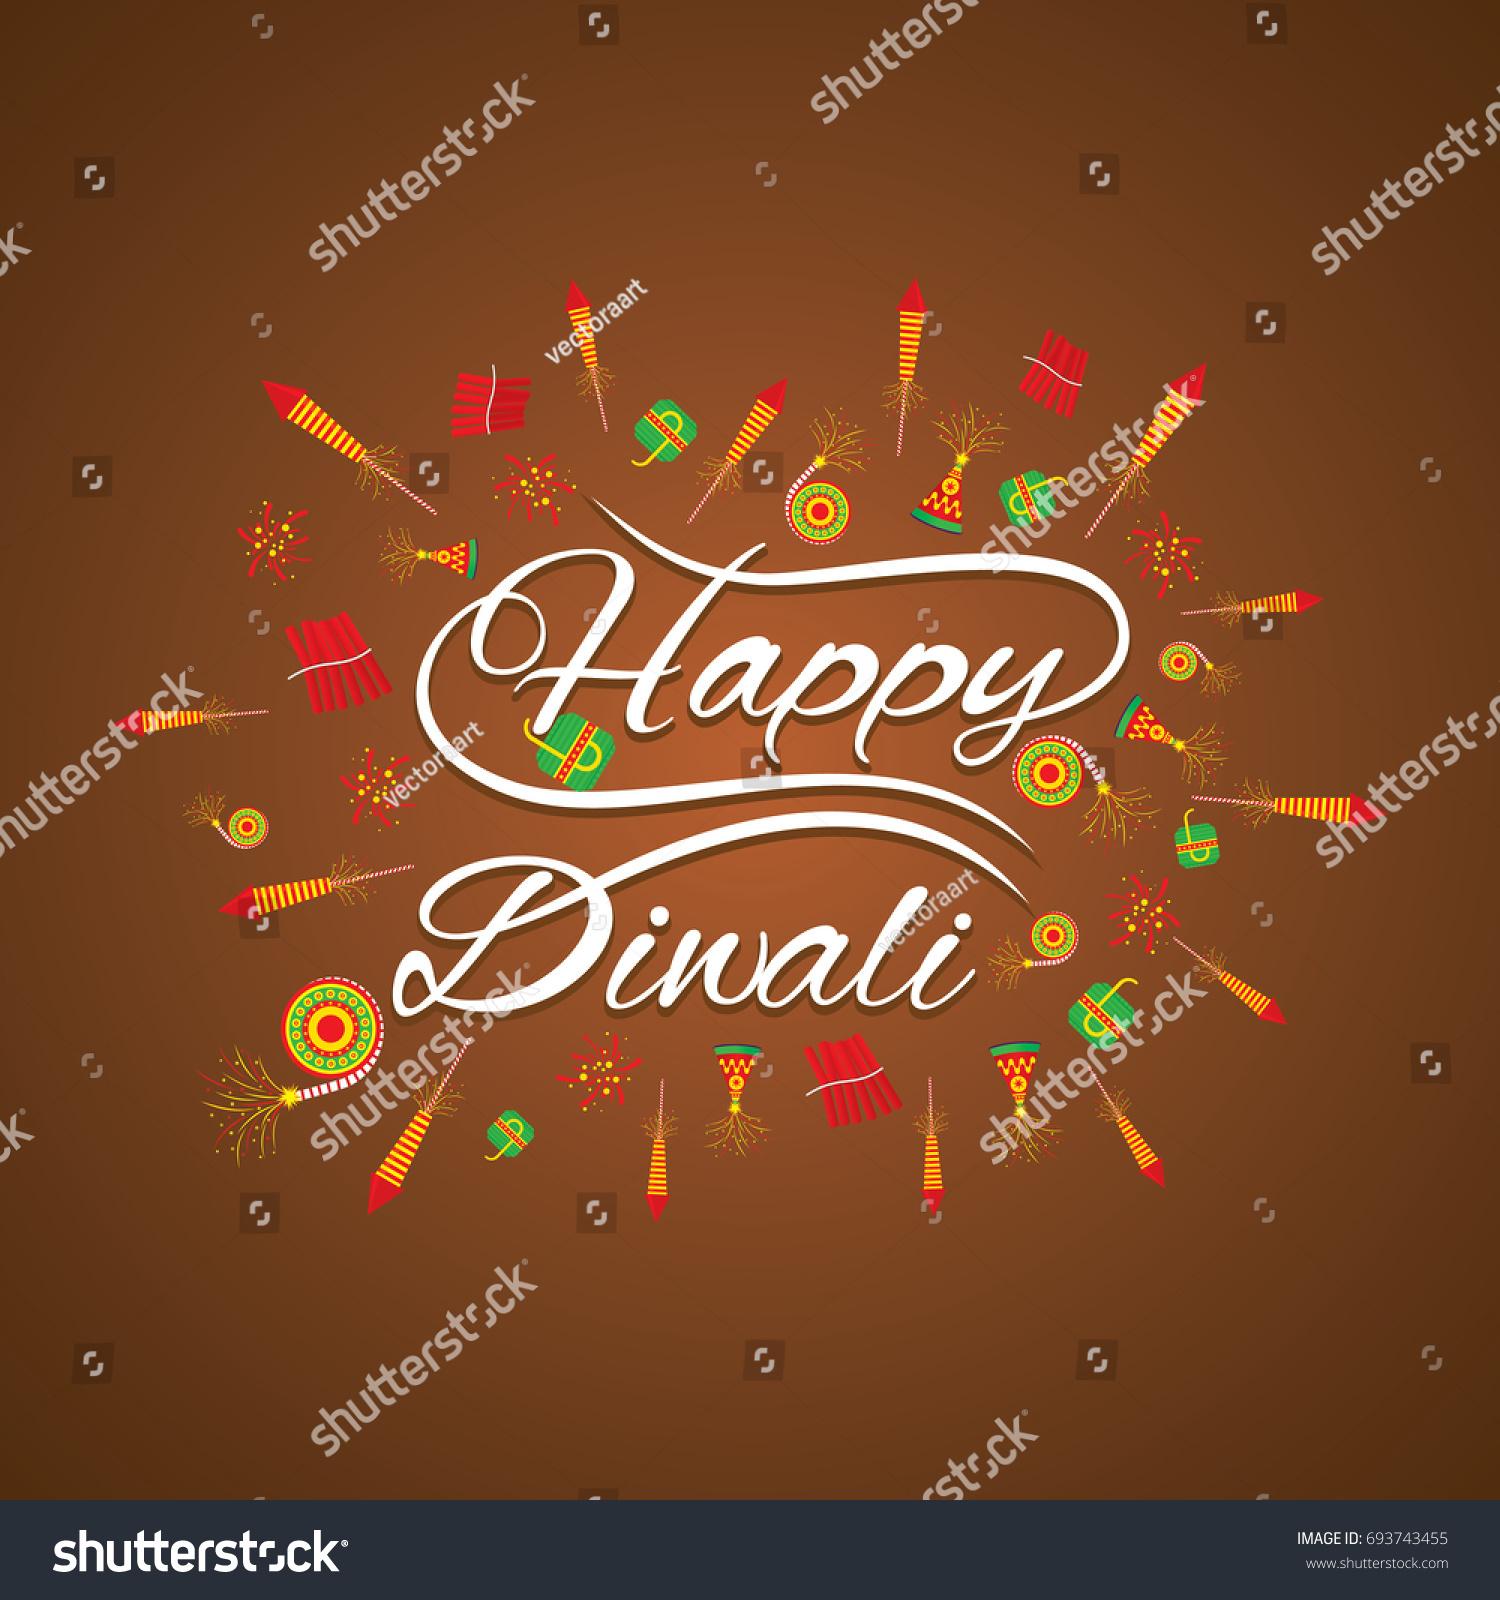 Happy Diwali Greeting Card Fire Cracker Stock Vector Royalty Free